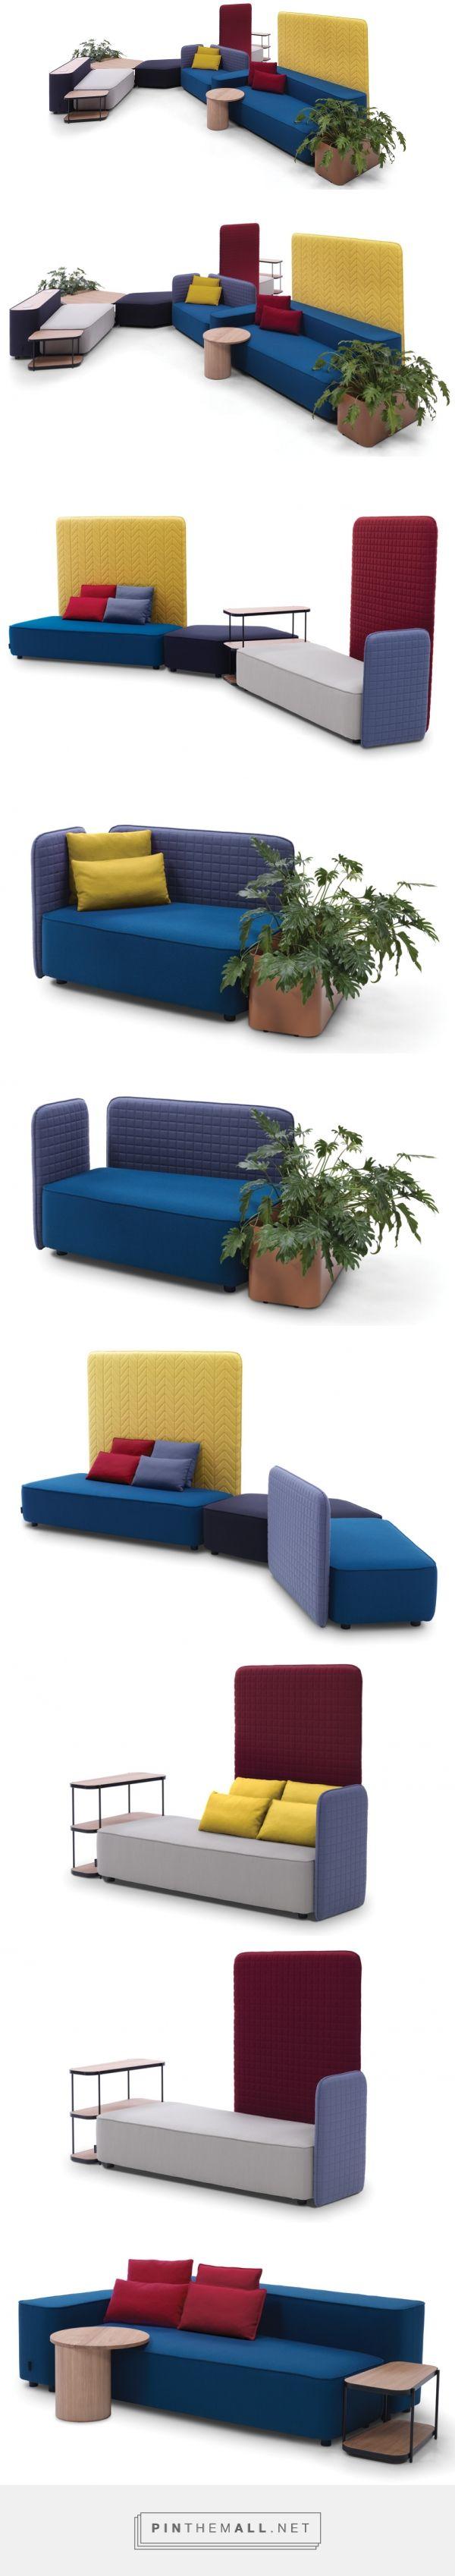 luca nichetto's adaptable furnishing system 'lofoten' for casamania - created via https://pinthemall.net